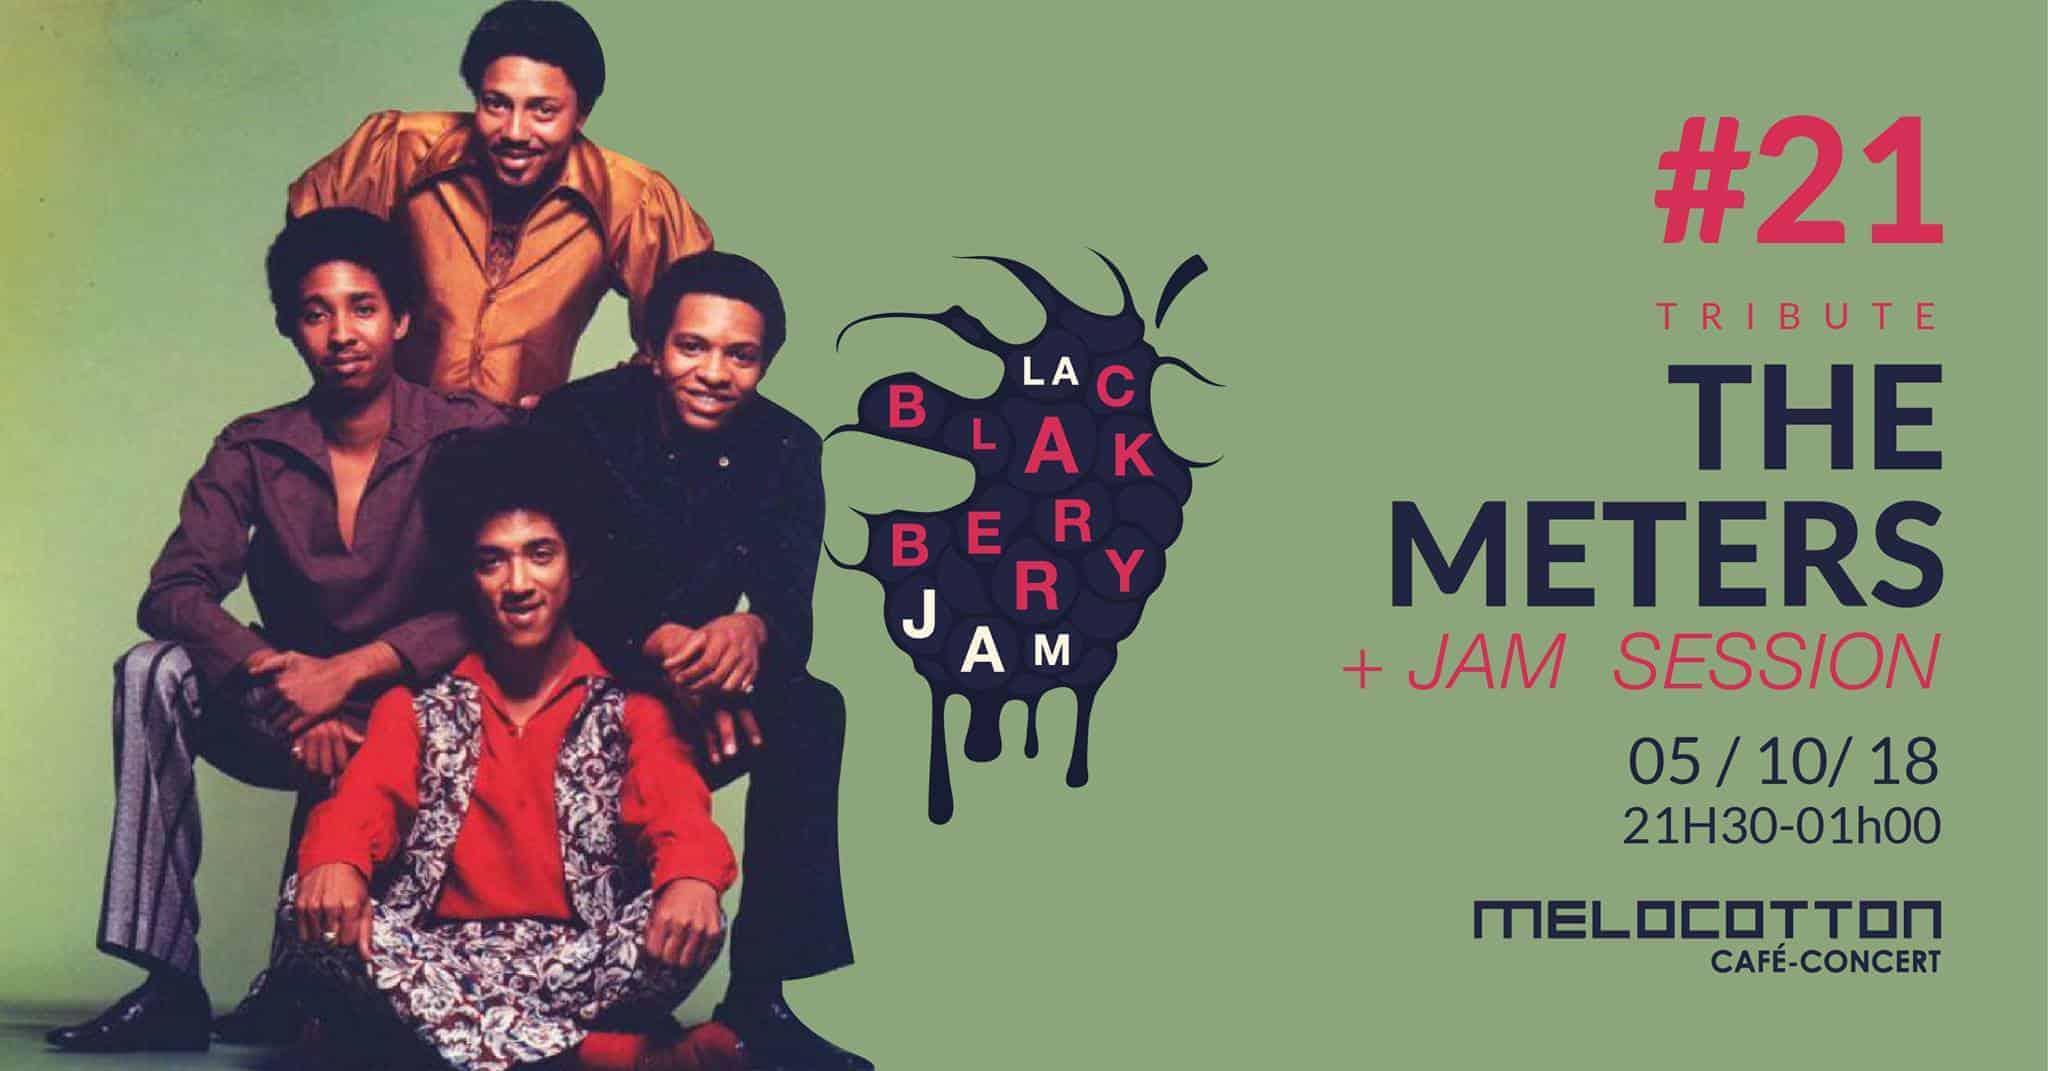 black berry jam